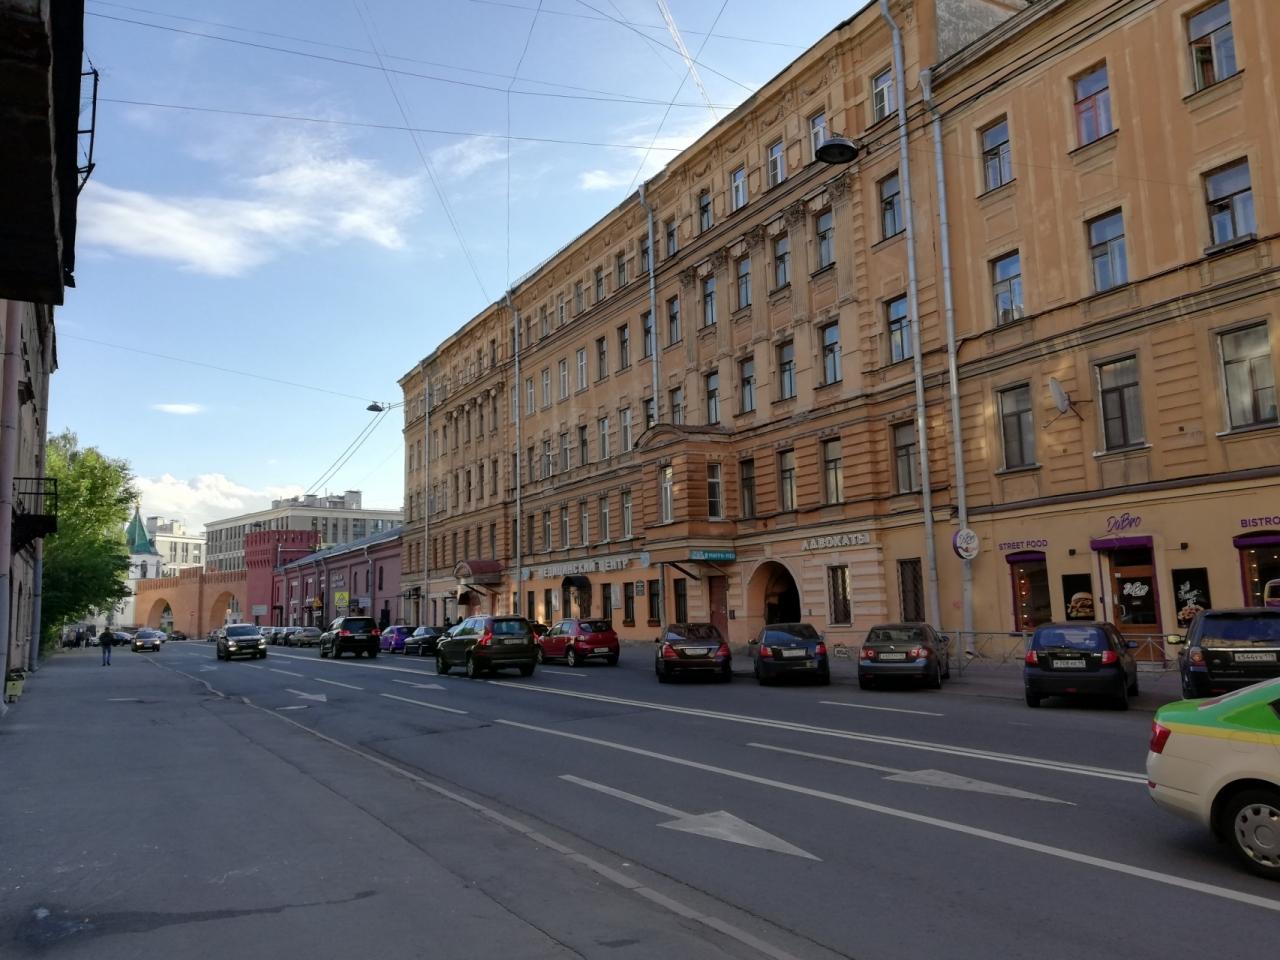 http://gja.pro.bkn.ru/images/s_big/6598fbd4-6fa7-11e8-b425-448a5bd44c07.jpg